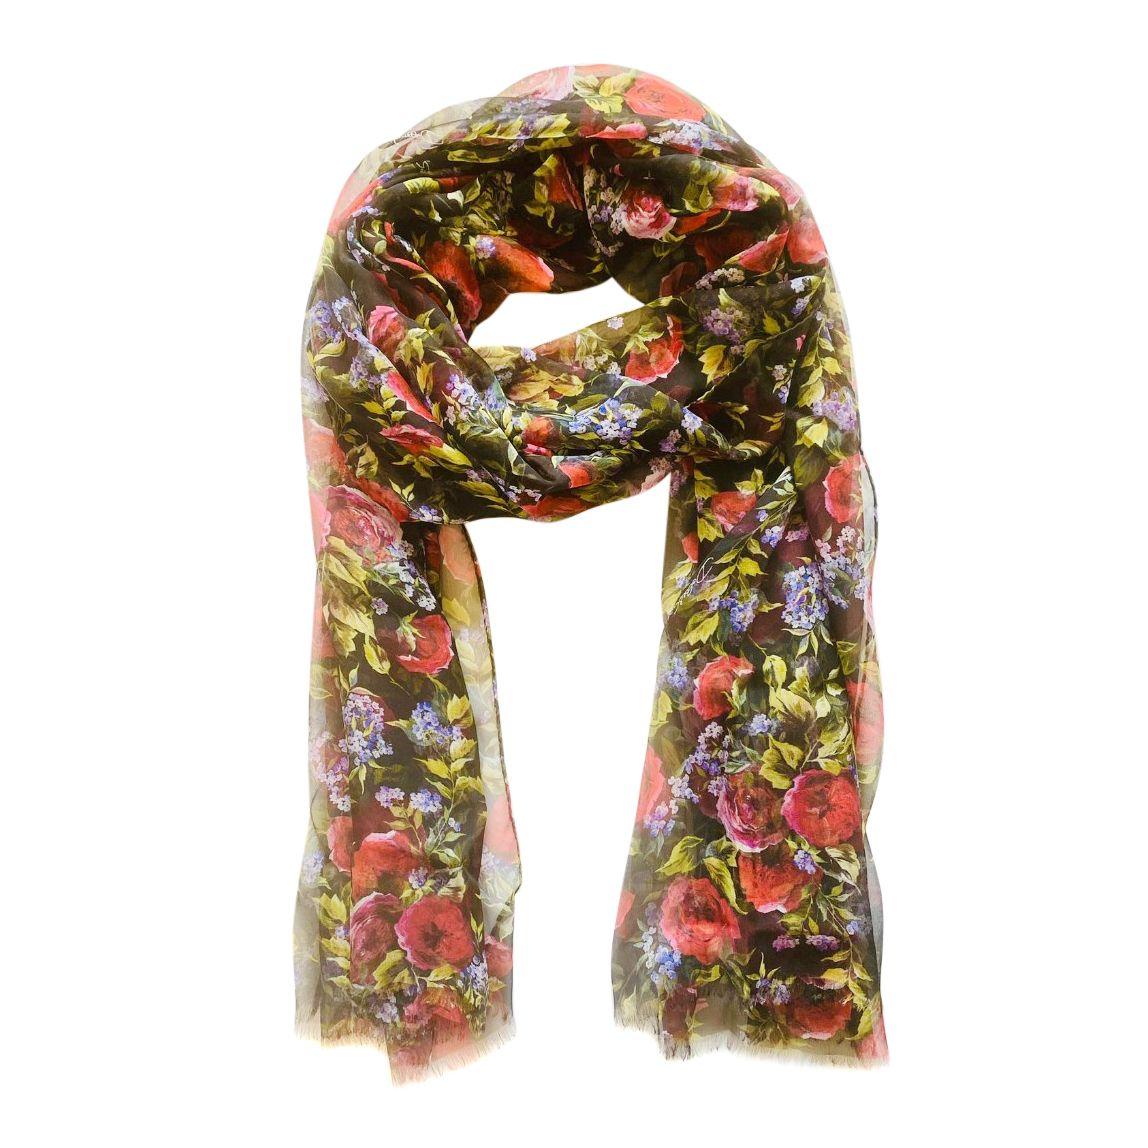 Dolce & Gabbana Black Floral Print Silk Scarf